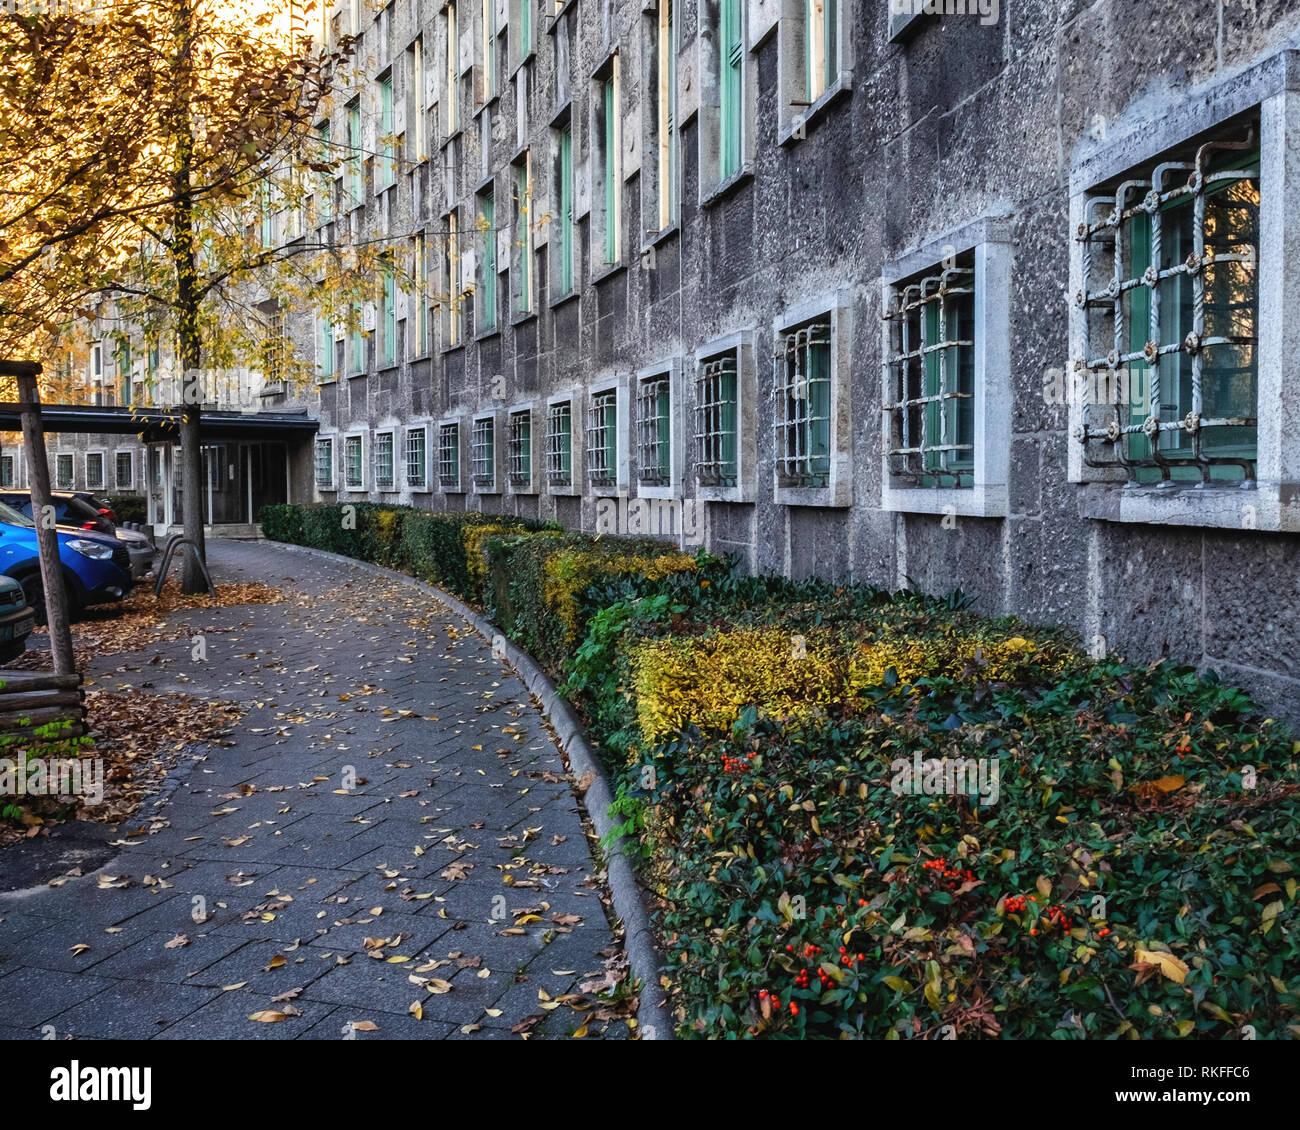 Berlin-Wilmersdorf. Fehrbelliner Platz 2. Nazi-era building built 1935-36 by Architect Otto Firle,Curved anterior facade with raised window casings. - Stock Image